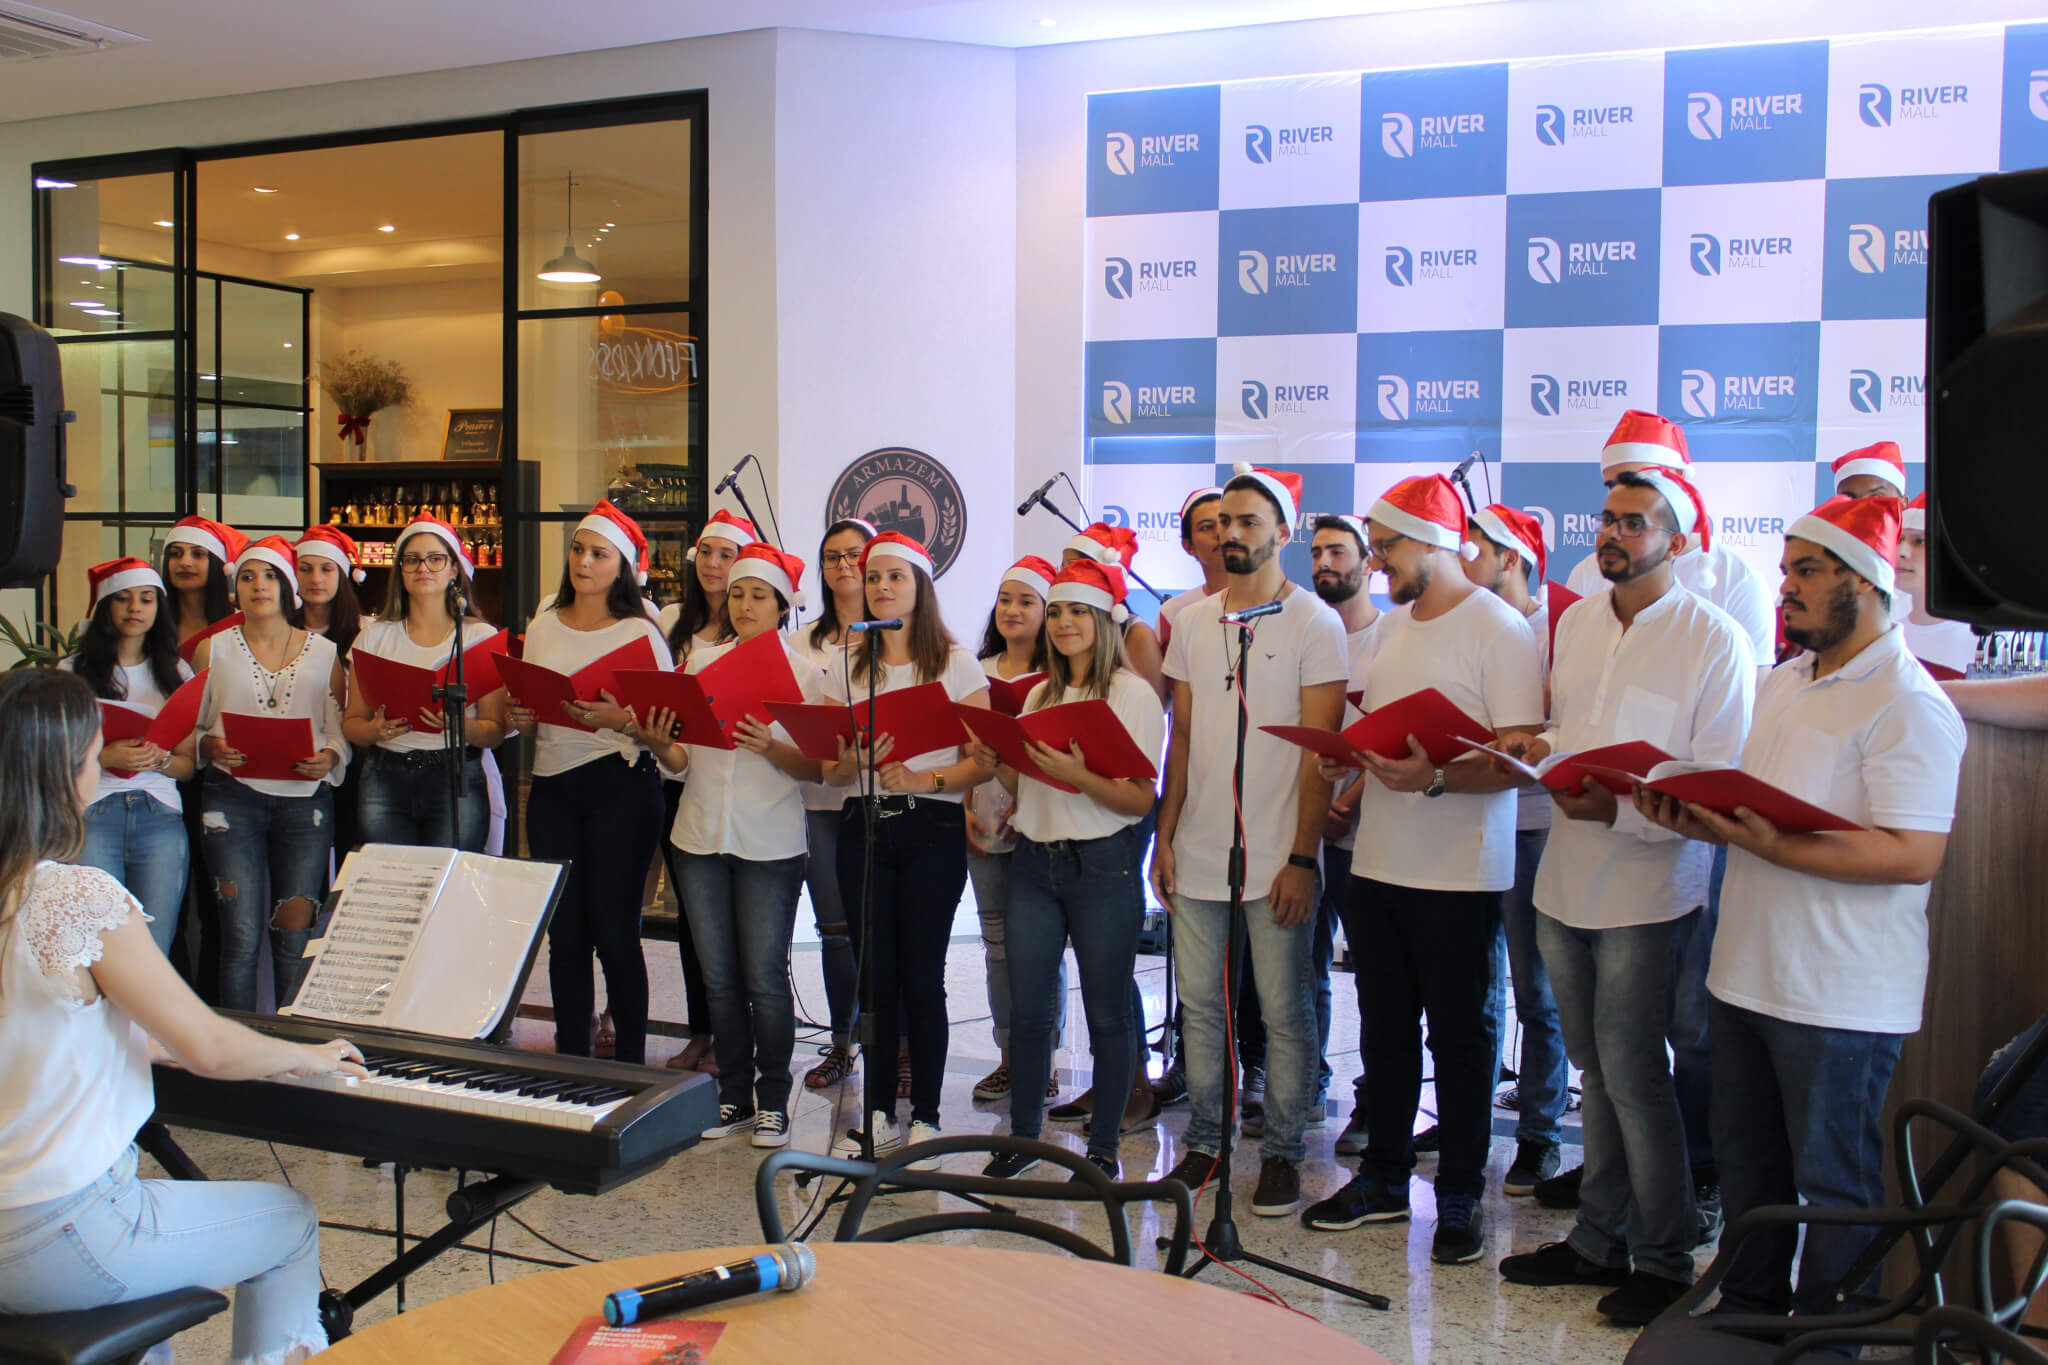 Coro UNIFEBE emociona público em Cantata de Natal no River Mall